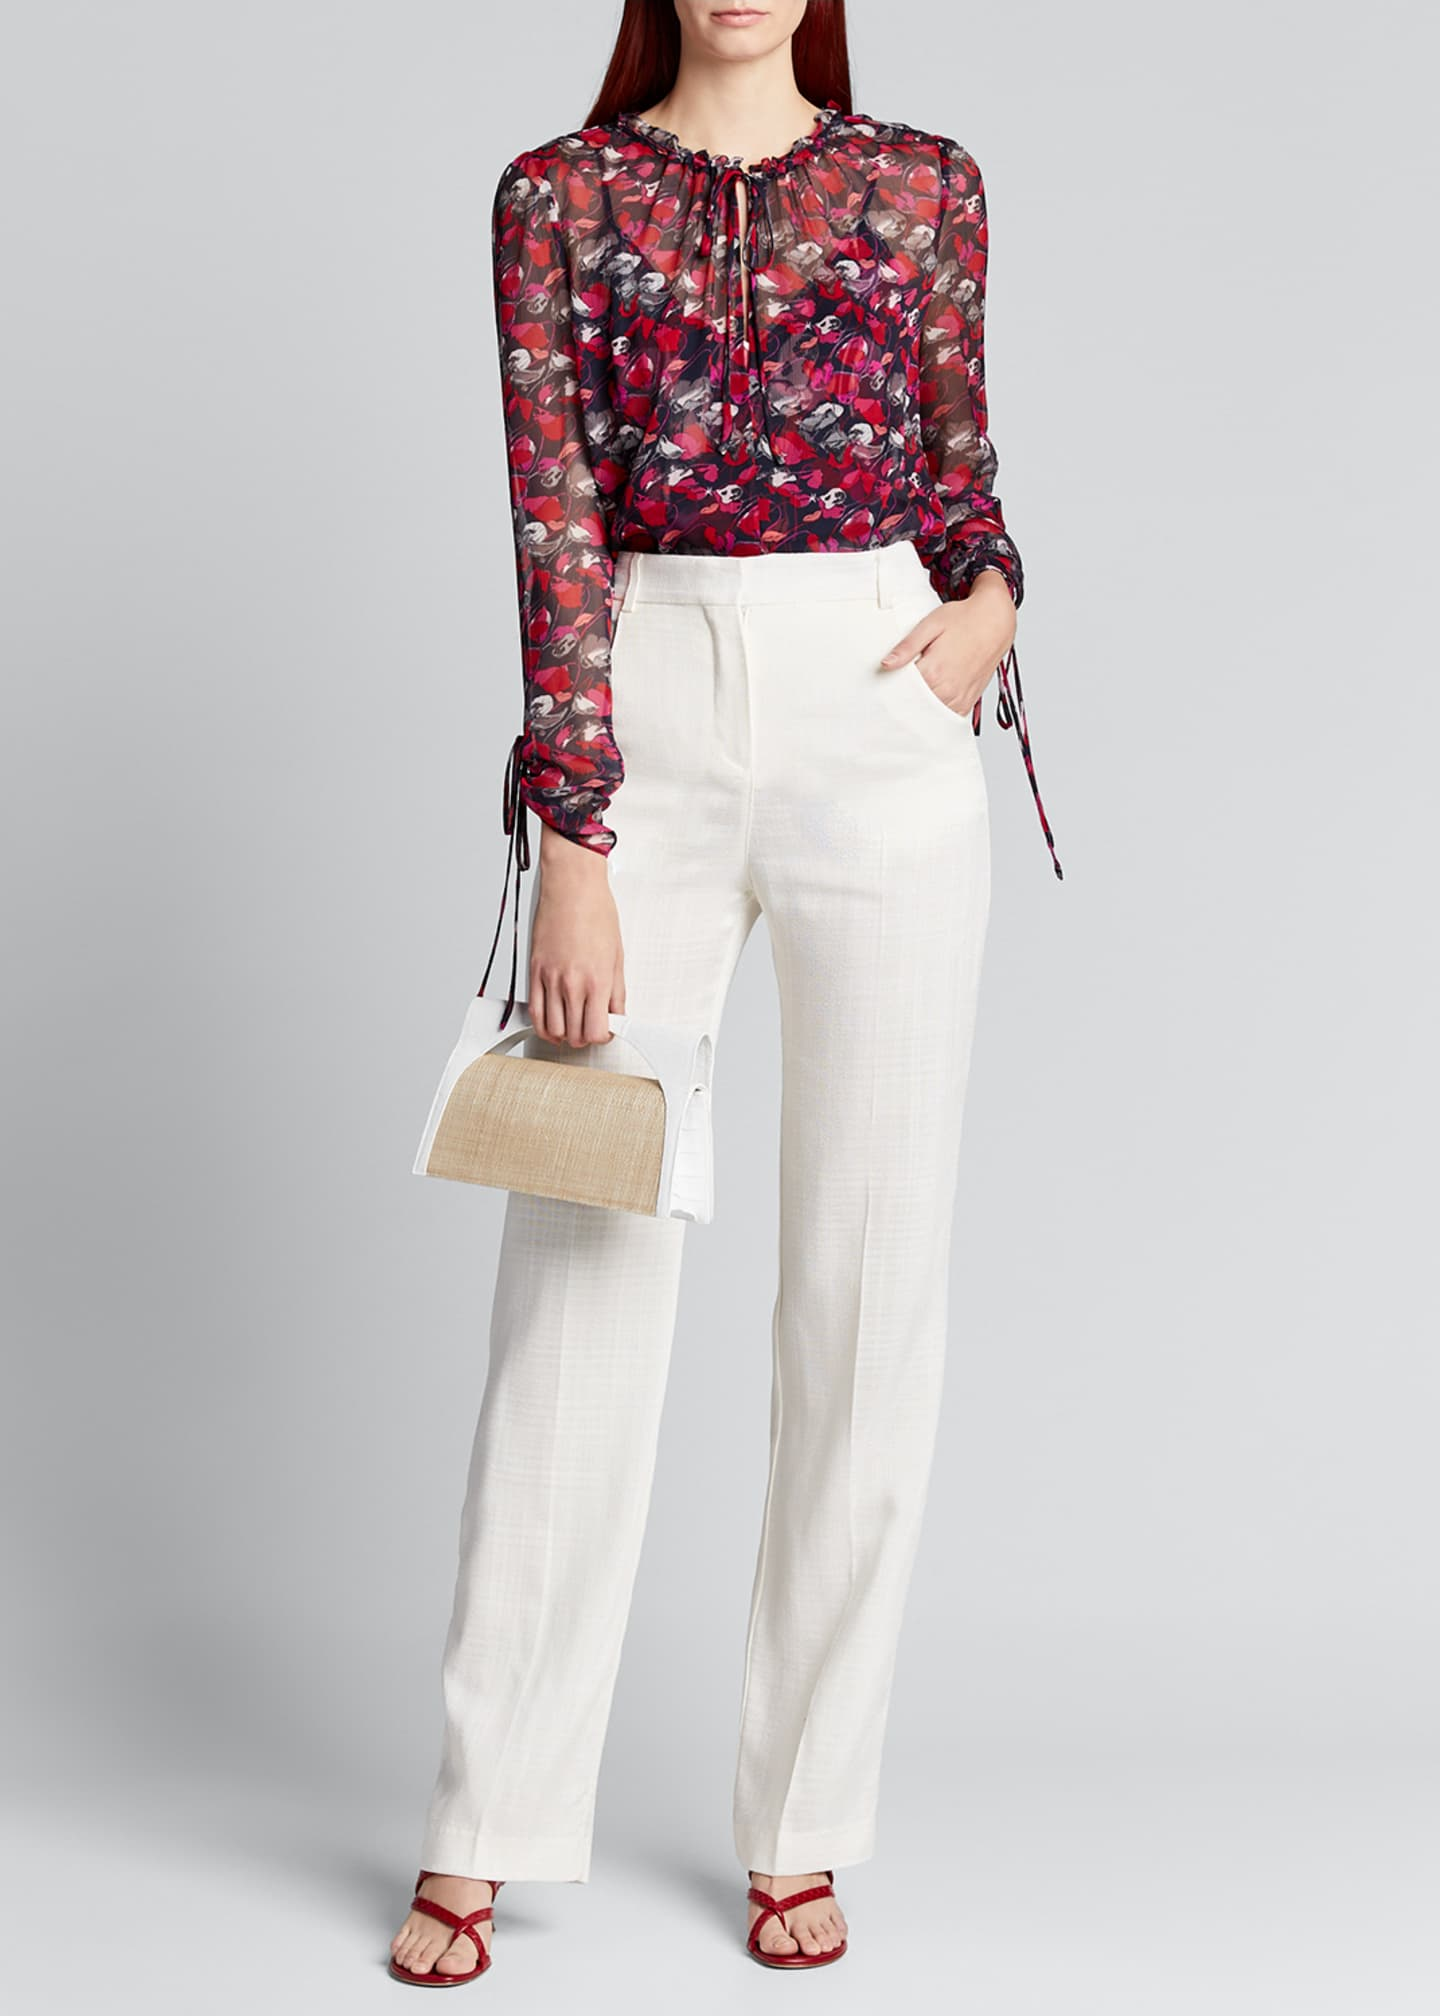 Diane von Furstenberg Lilian Floral Long-Sleeve Blouse